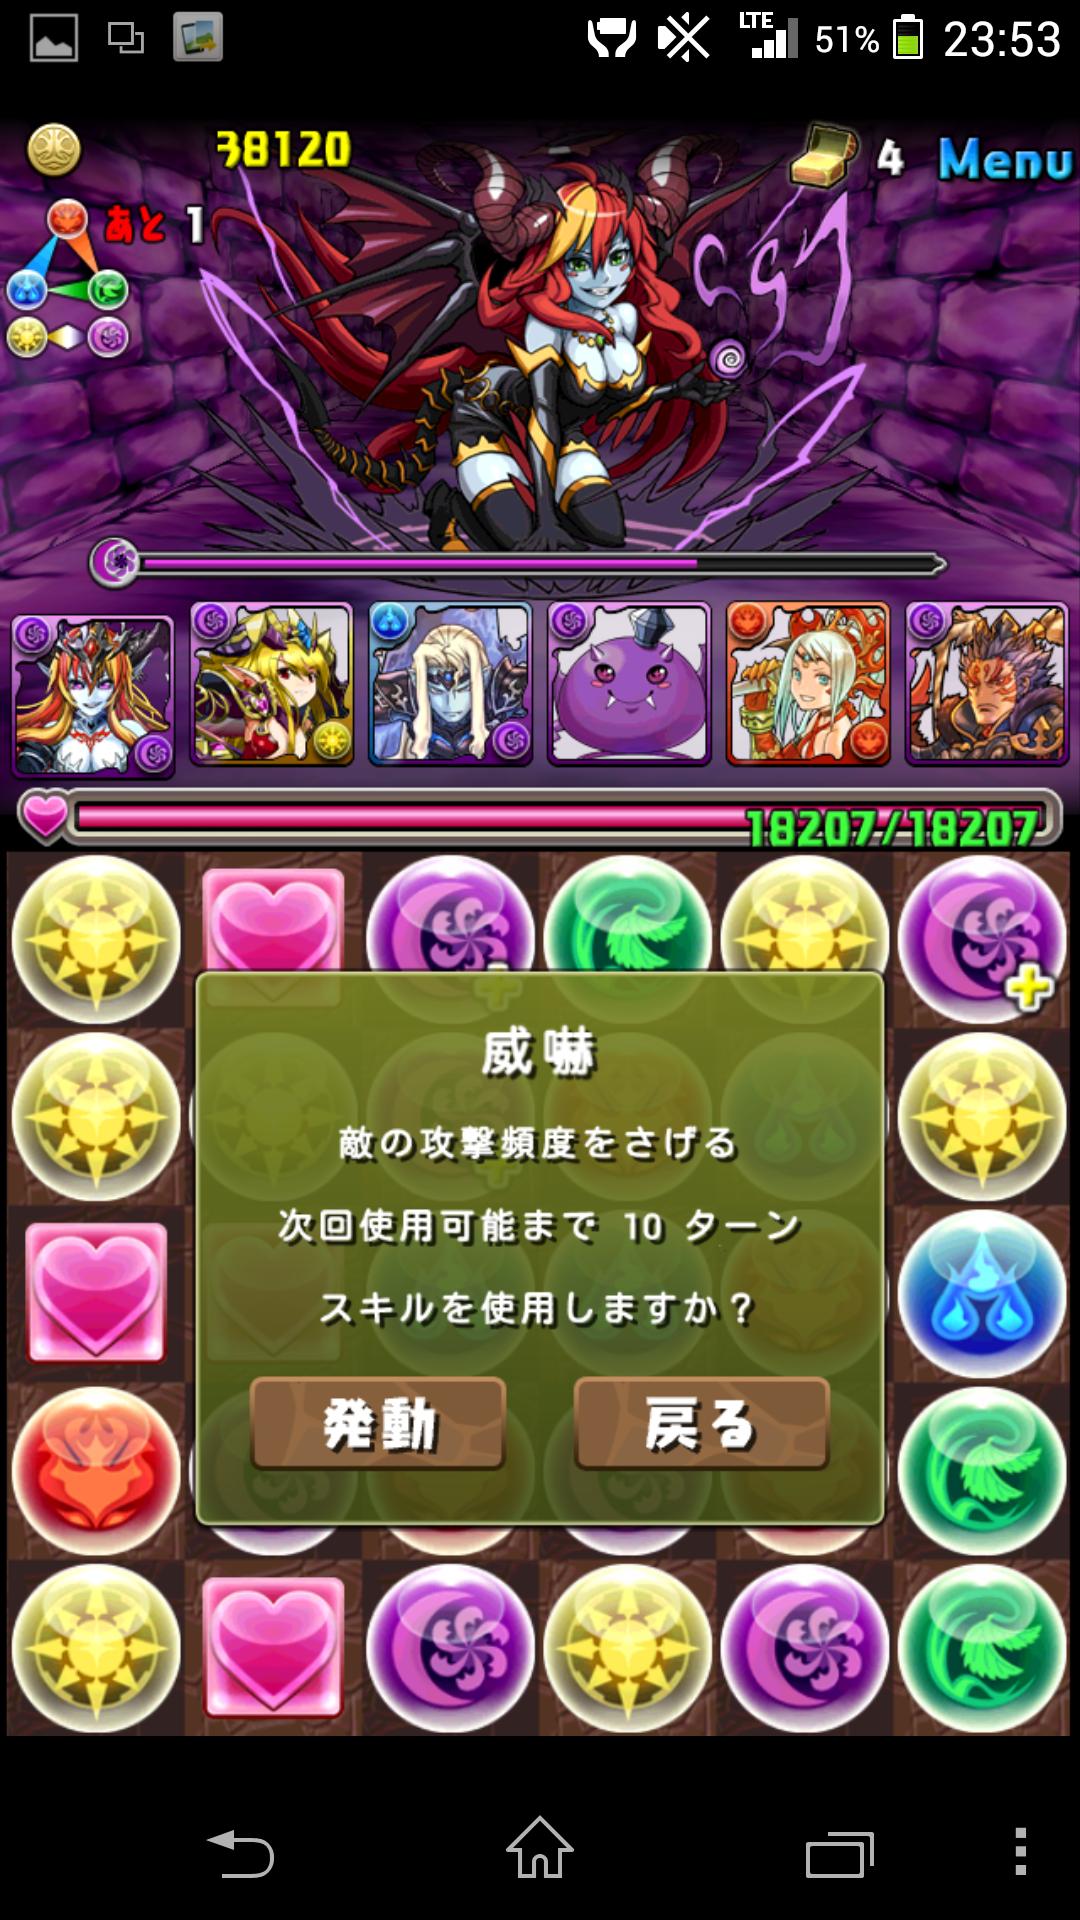 Screenshot_2014-04-17-23-53-51.png